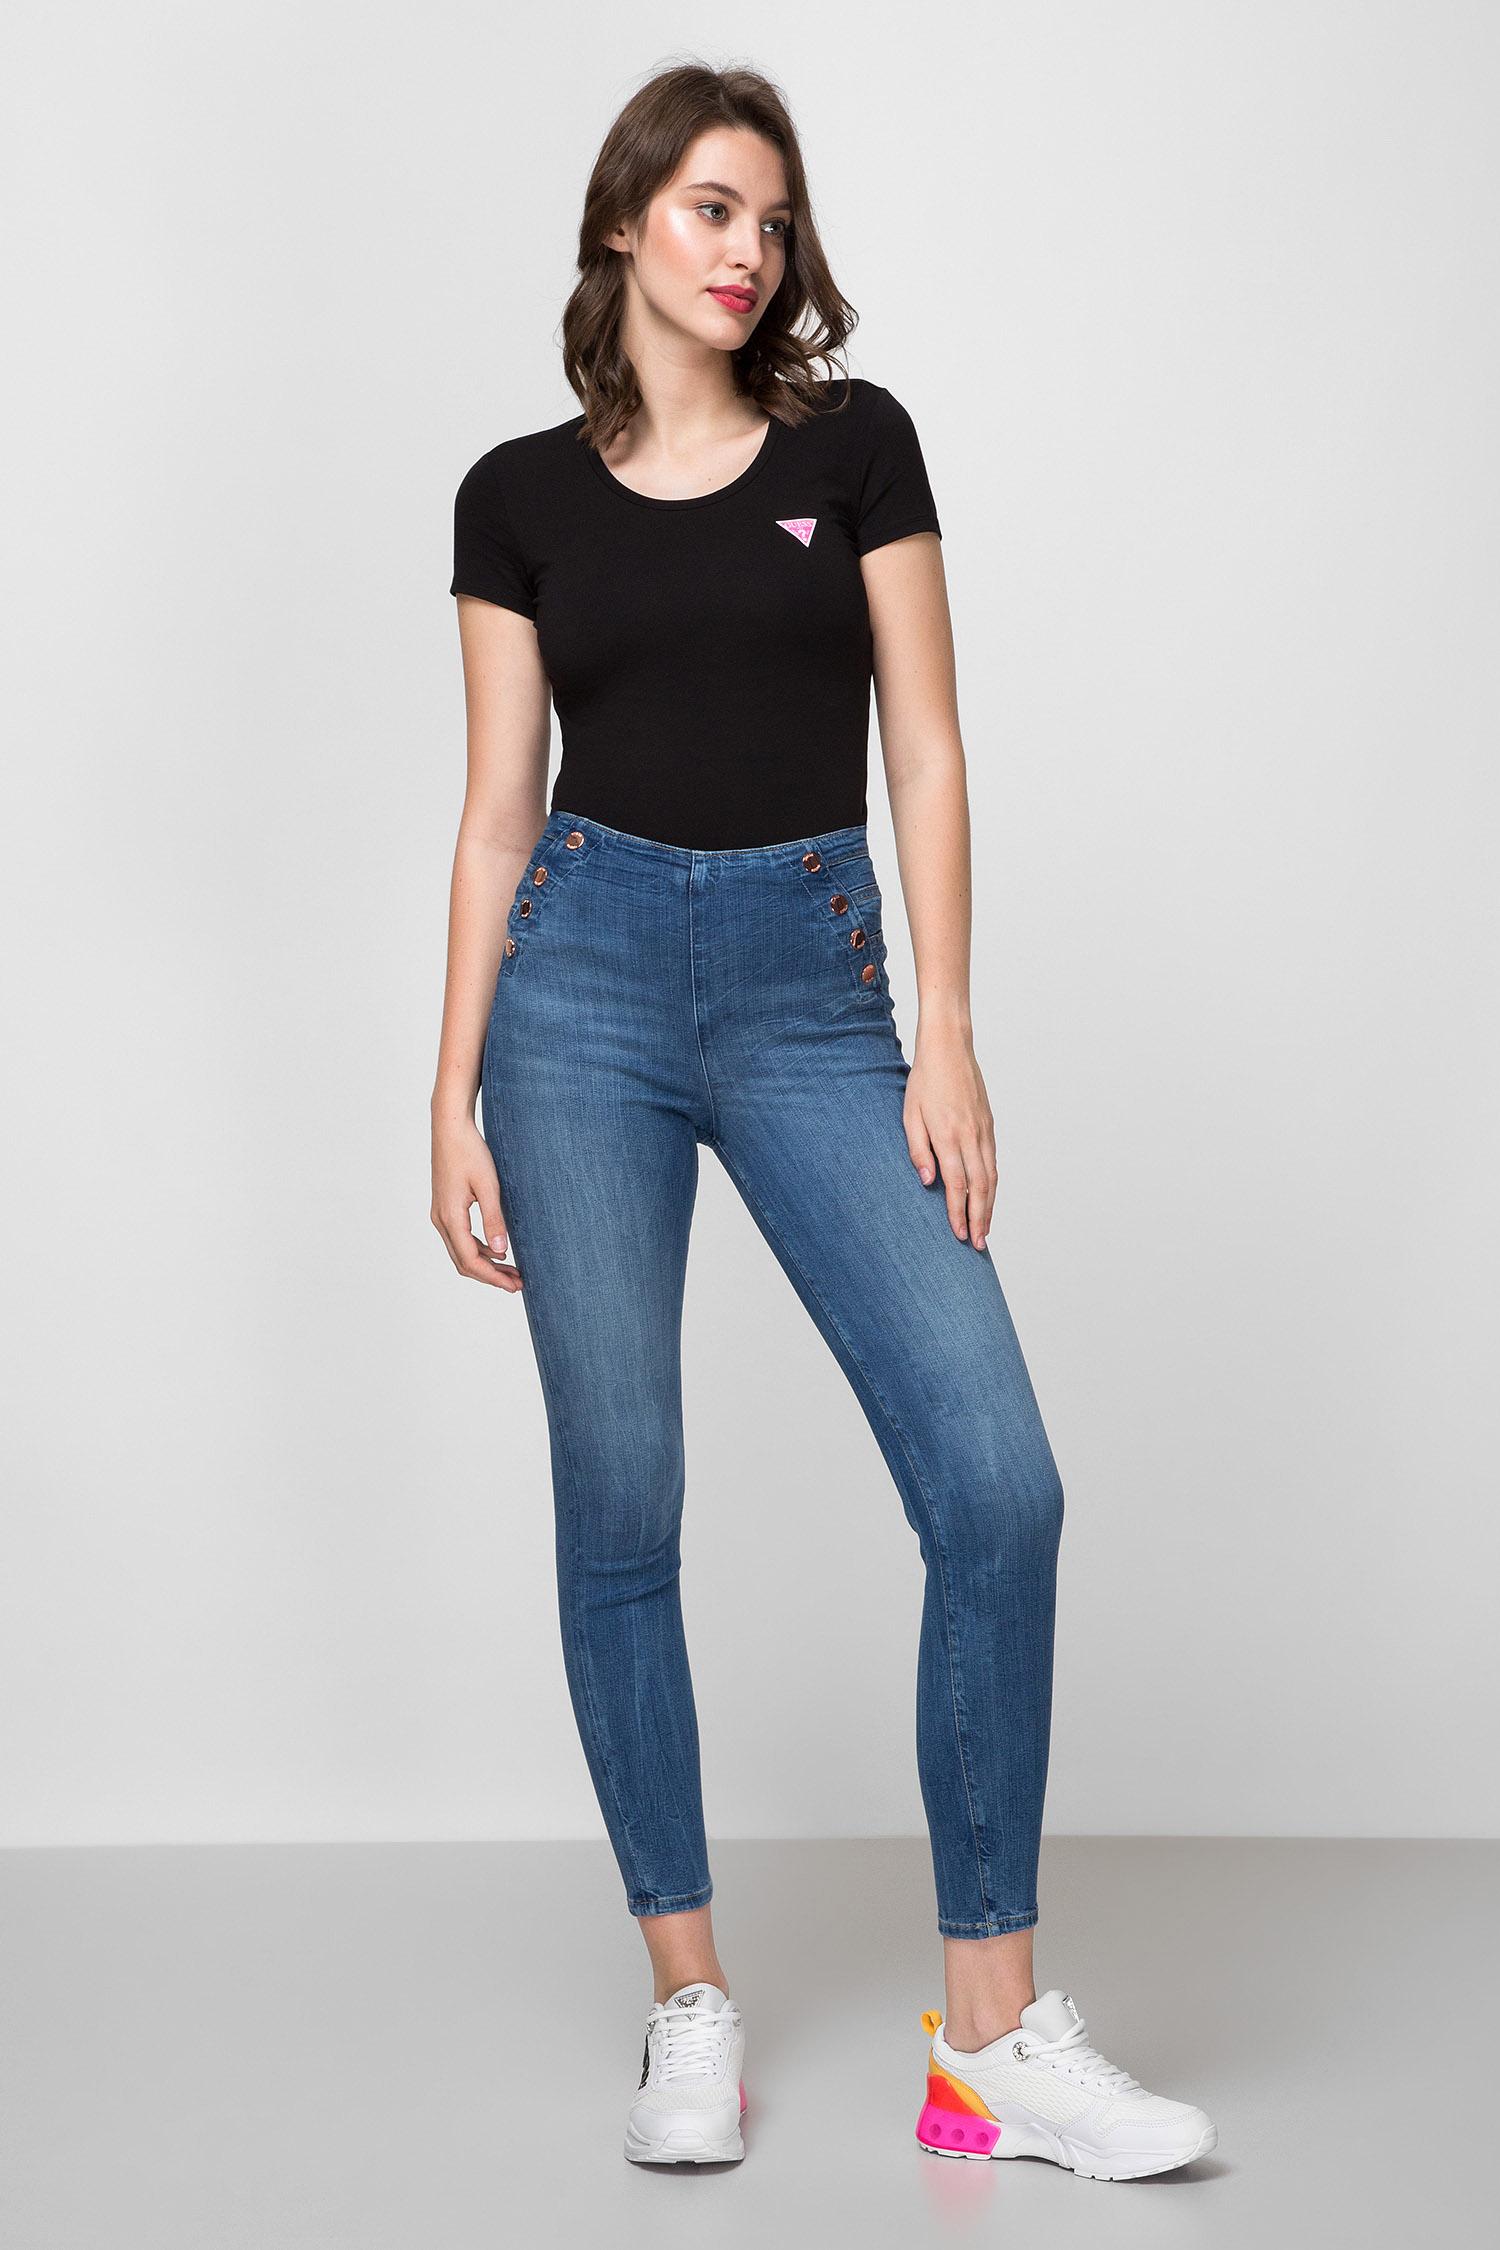 Женская черная футболка Guess W0YI87.J1300;JBLK